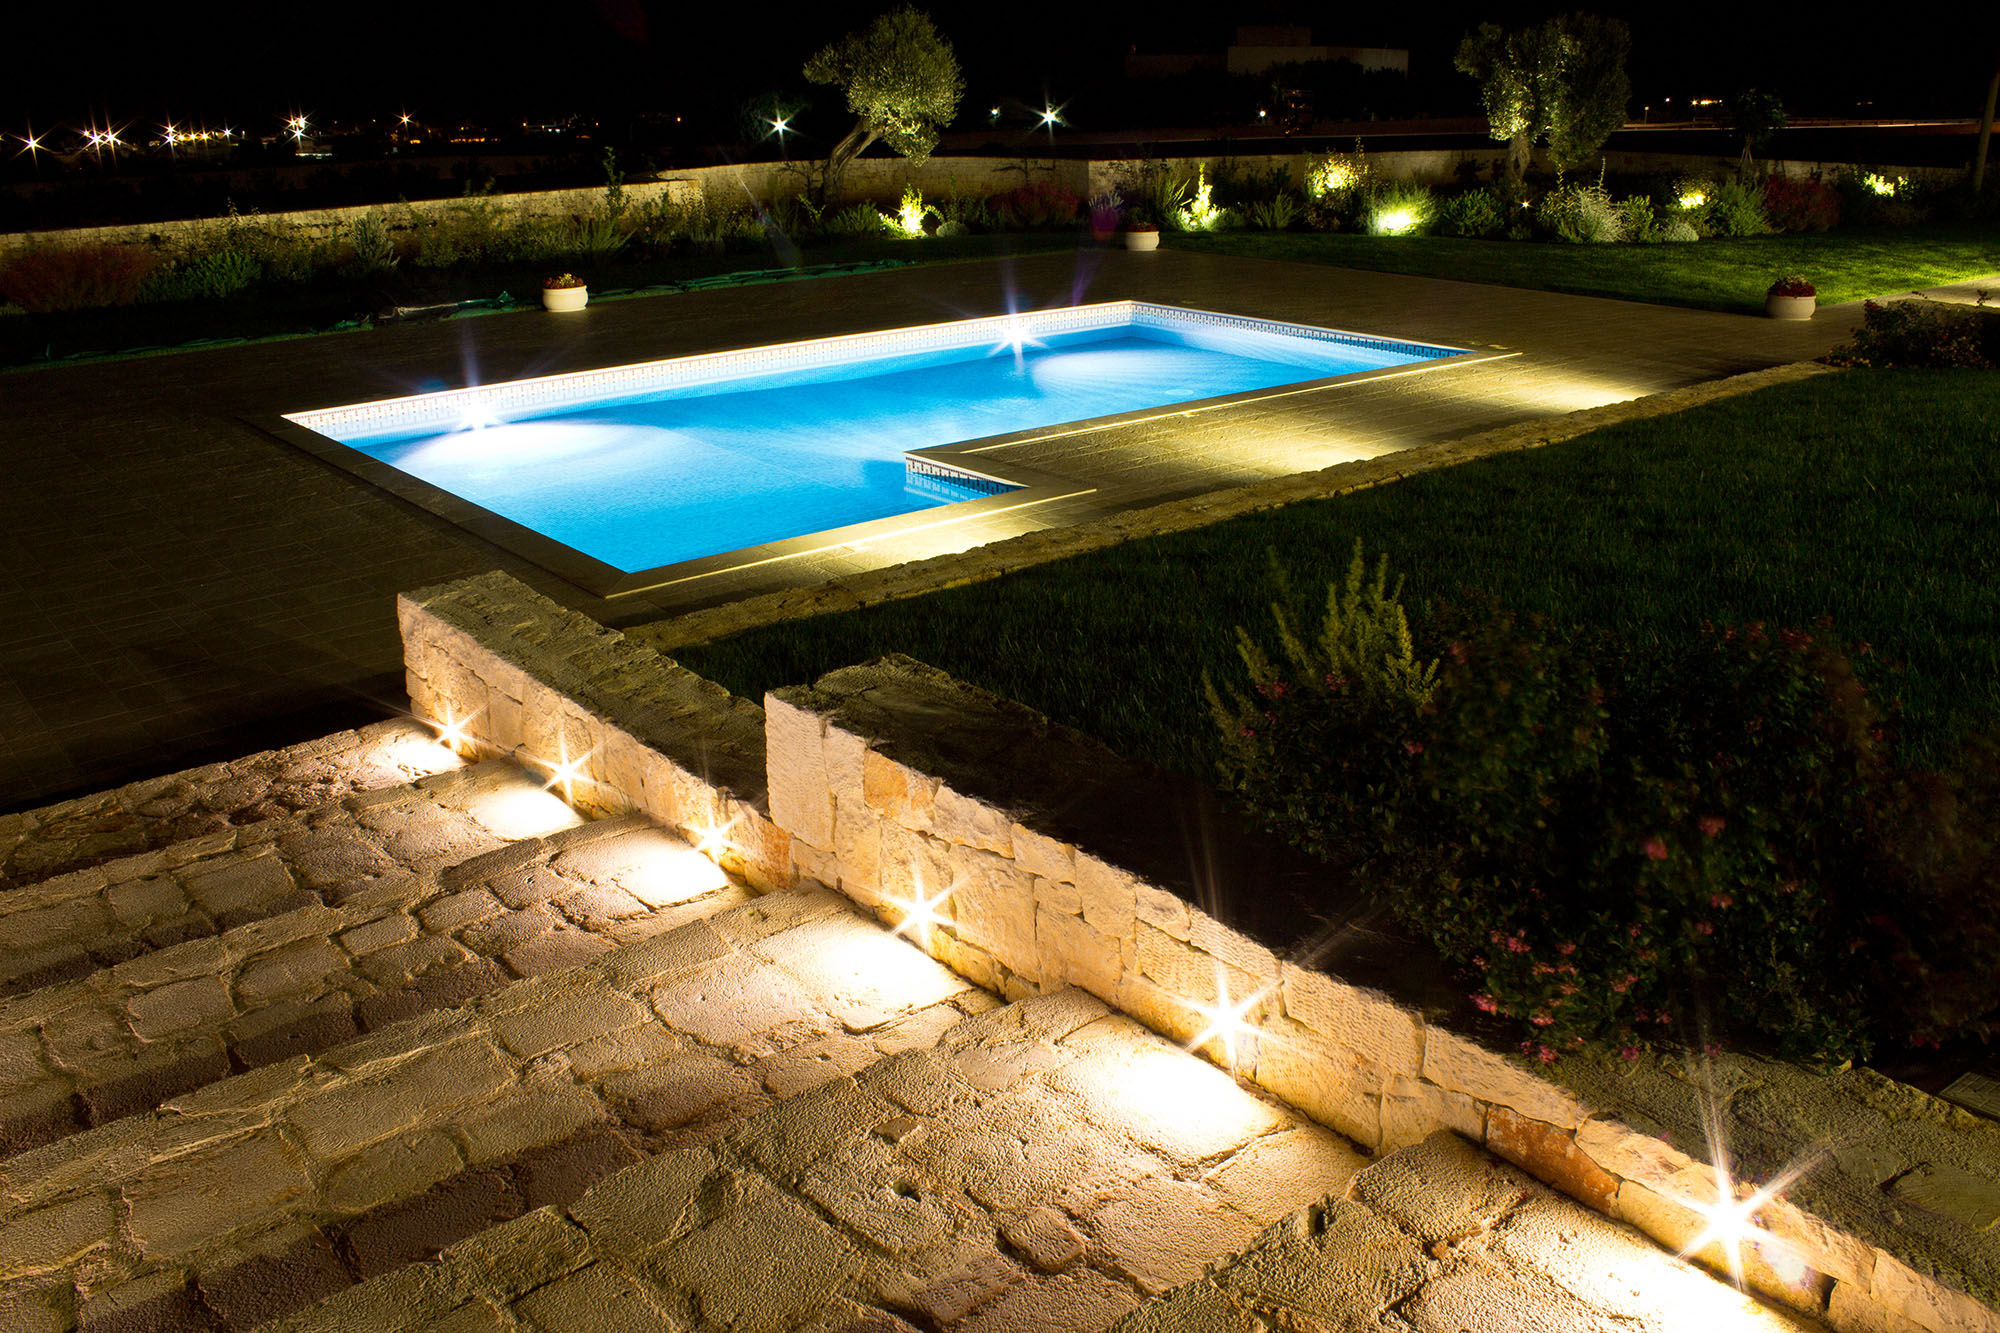 Flore - casa Michele - giardino piscina